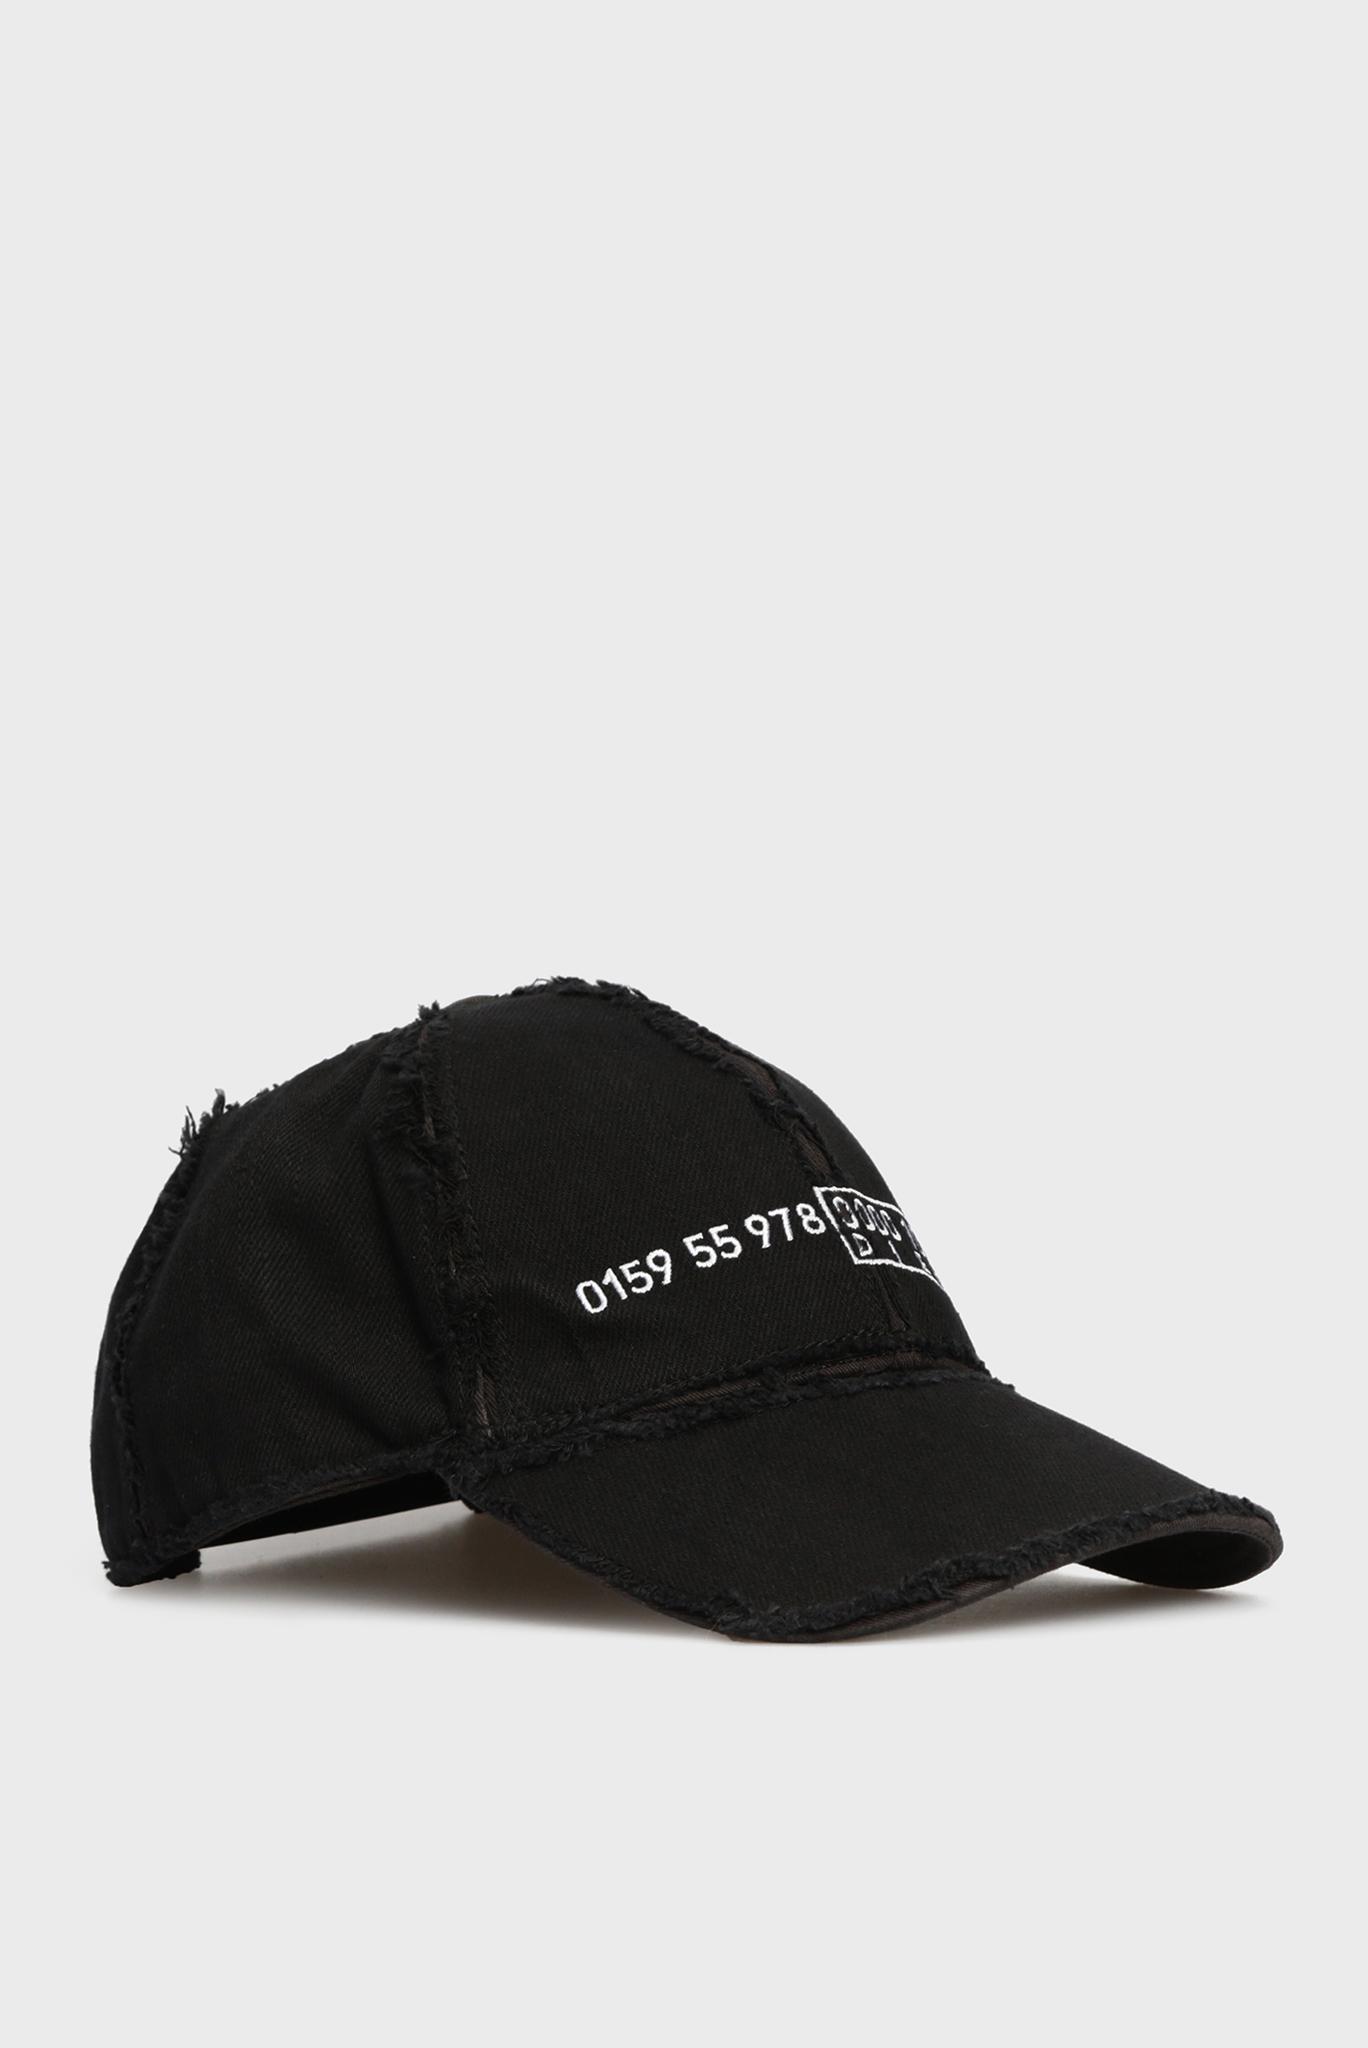 Женская черная кепка CIREVERSE Diesel